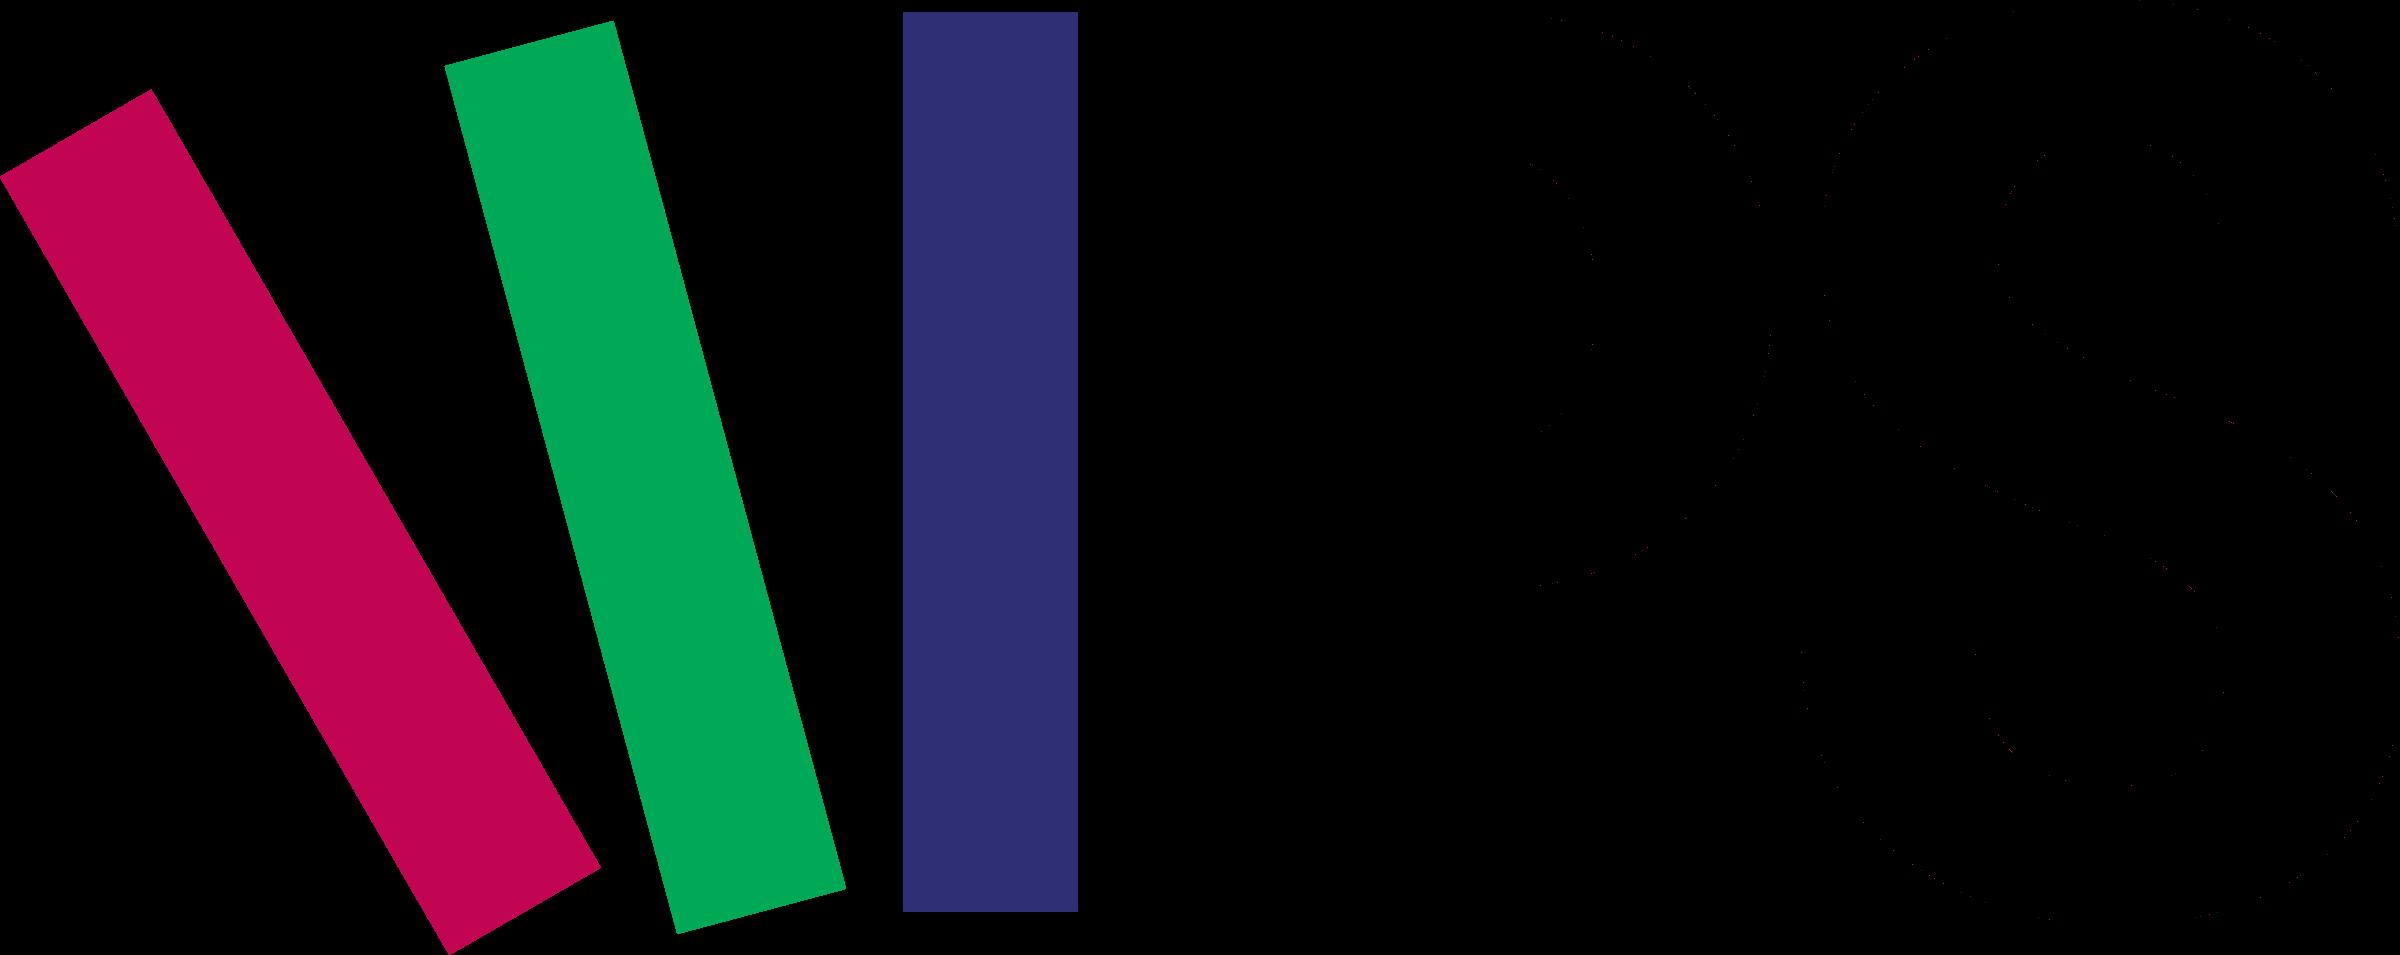 2020 - D - KONSEP IPS LANJUT